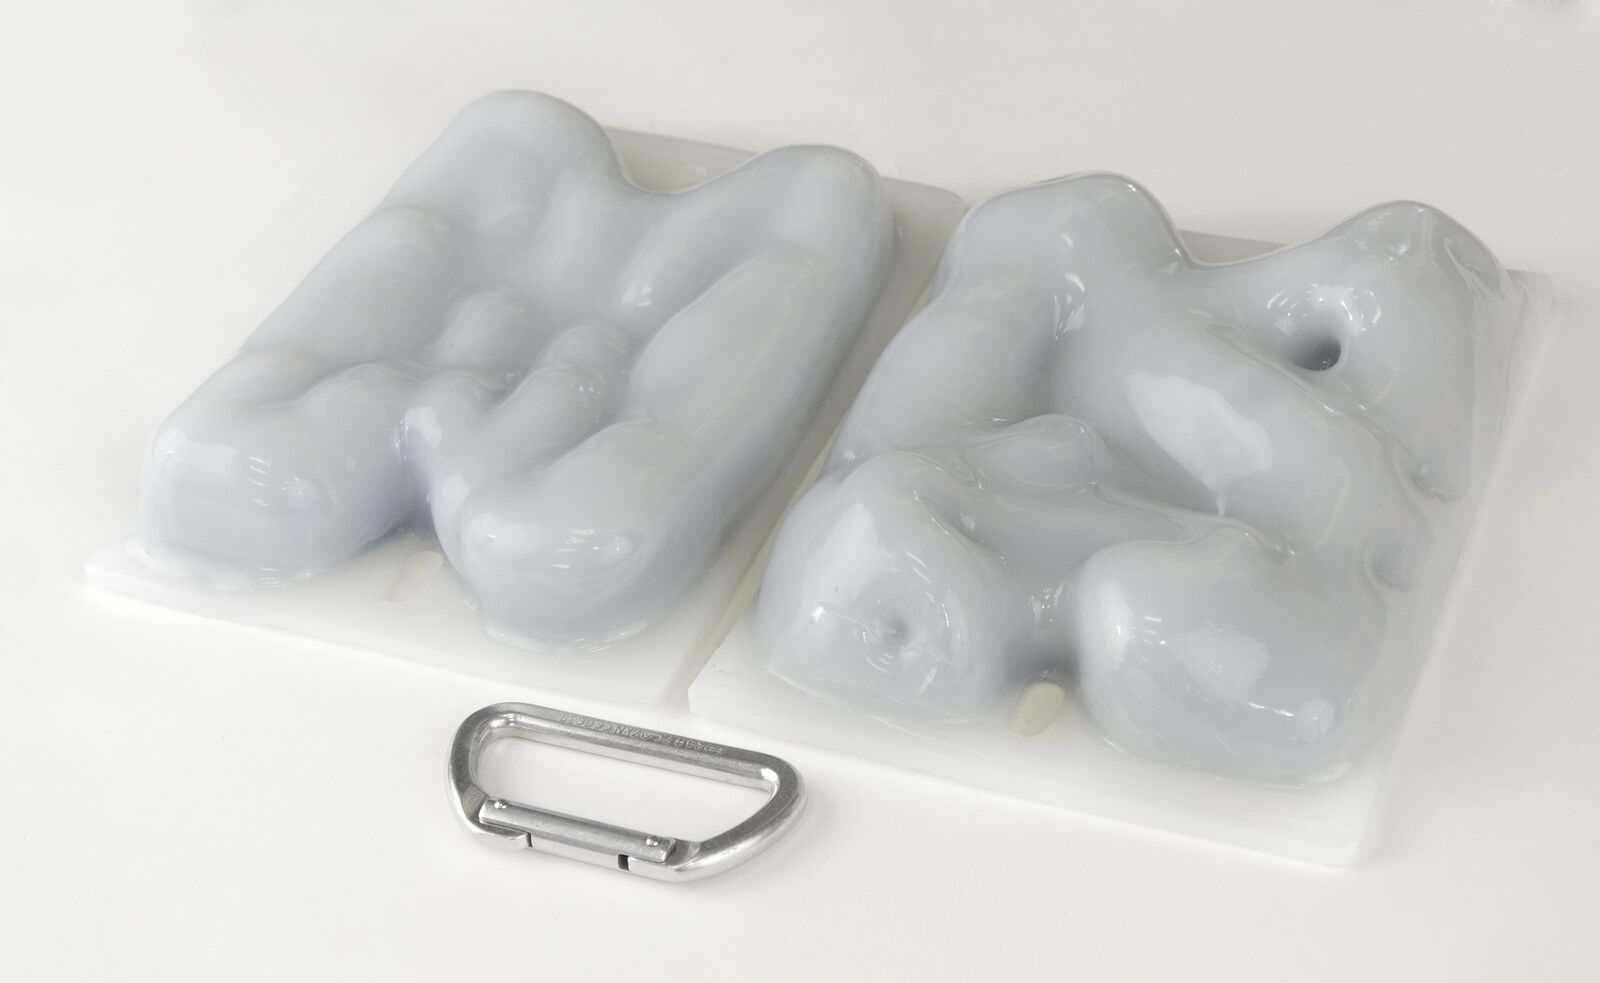 Ice Holdz - North American 2 Pack Eisklettergriffe Drytooling Klettertraining